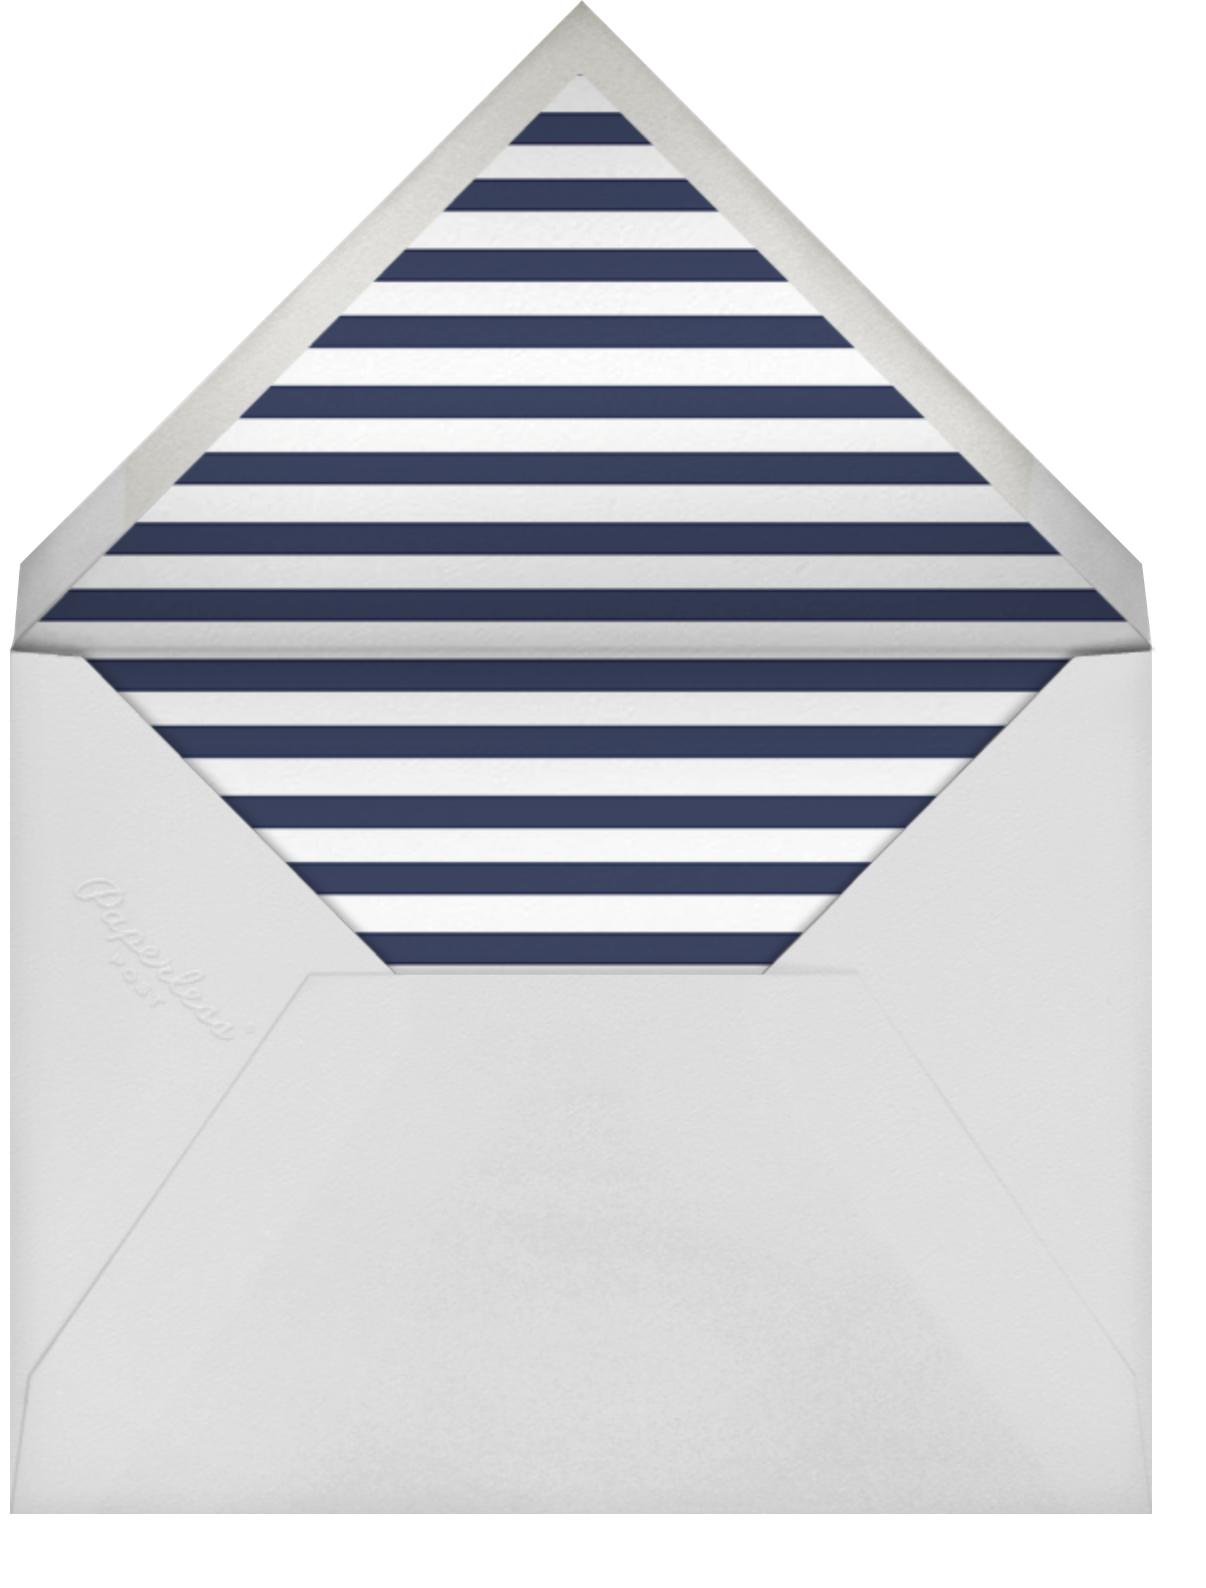 Put on Your Party Hat (Photo) - Blue - Sugar Paper - Virtual parties - envelope back